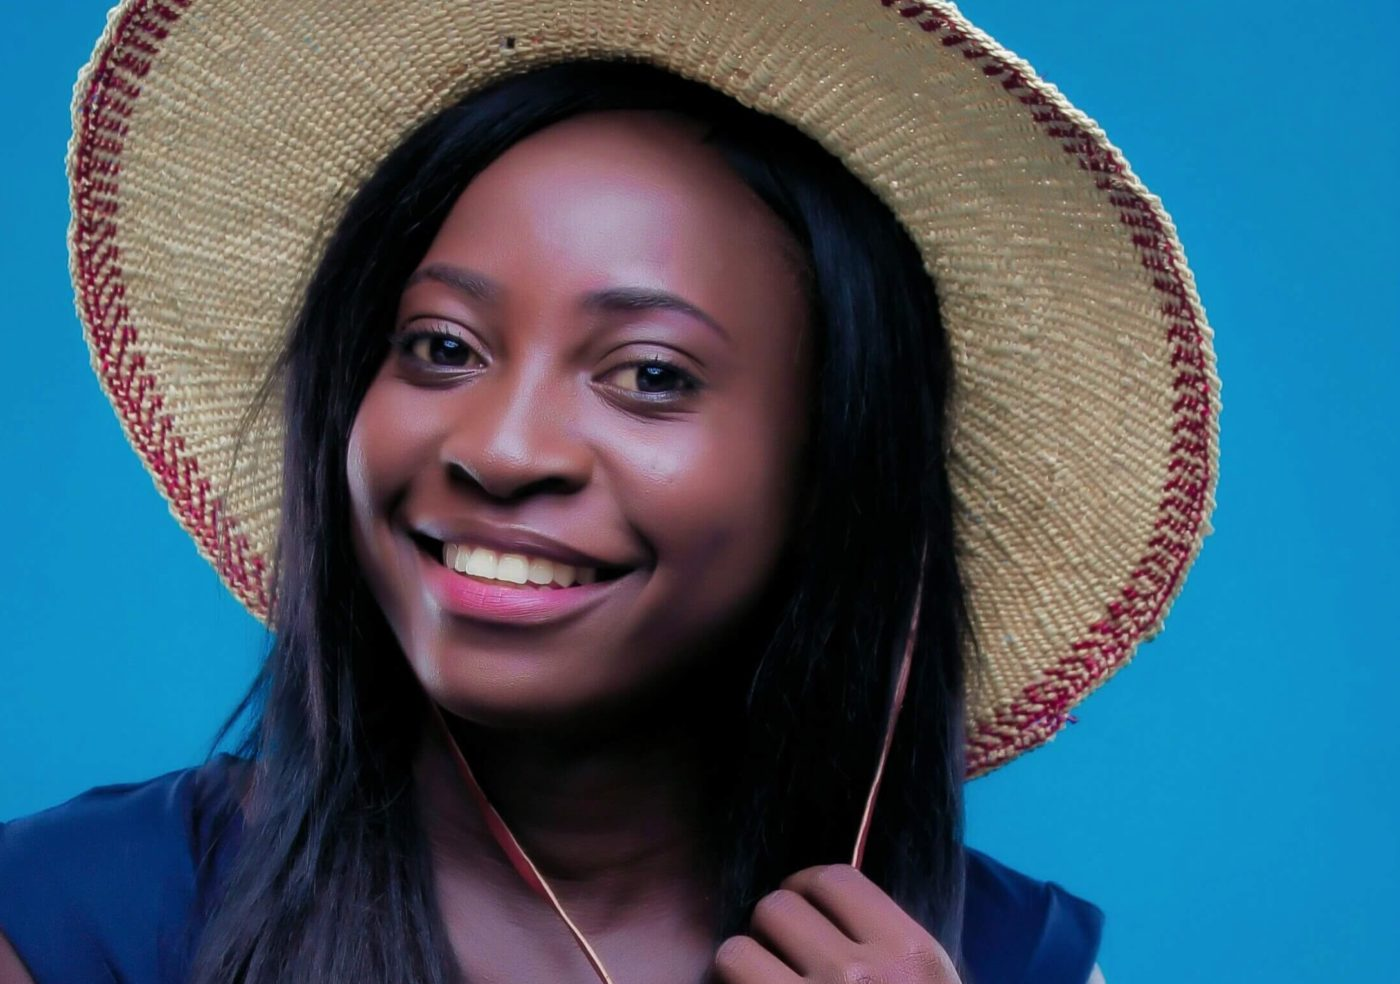 Maajoa Yeboah